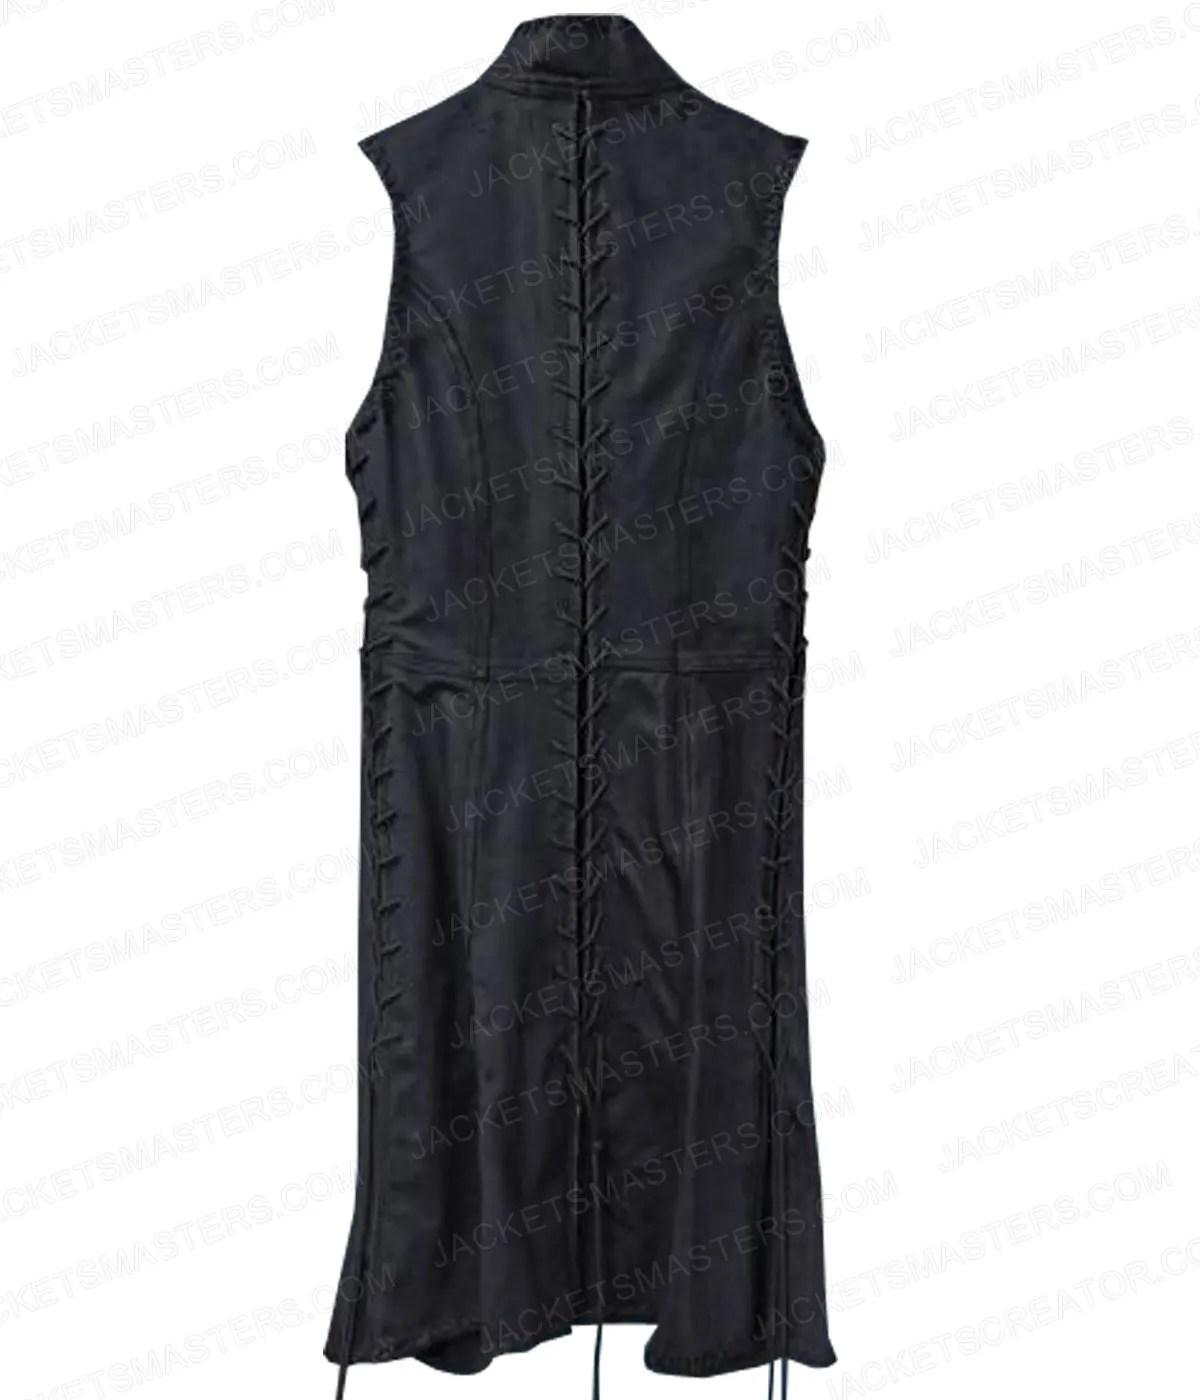 kylo-ren-leather-coat